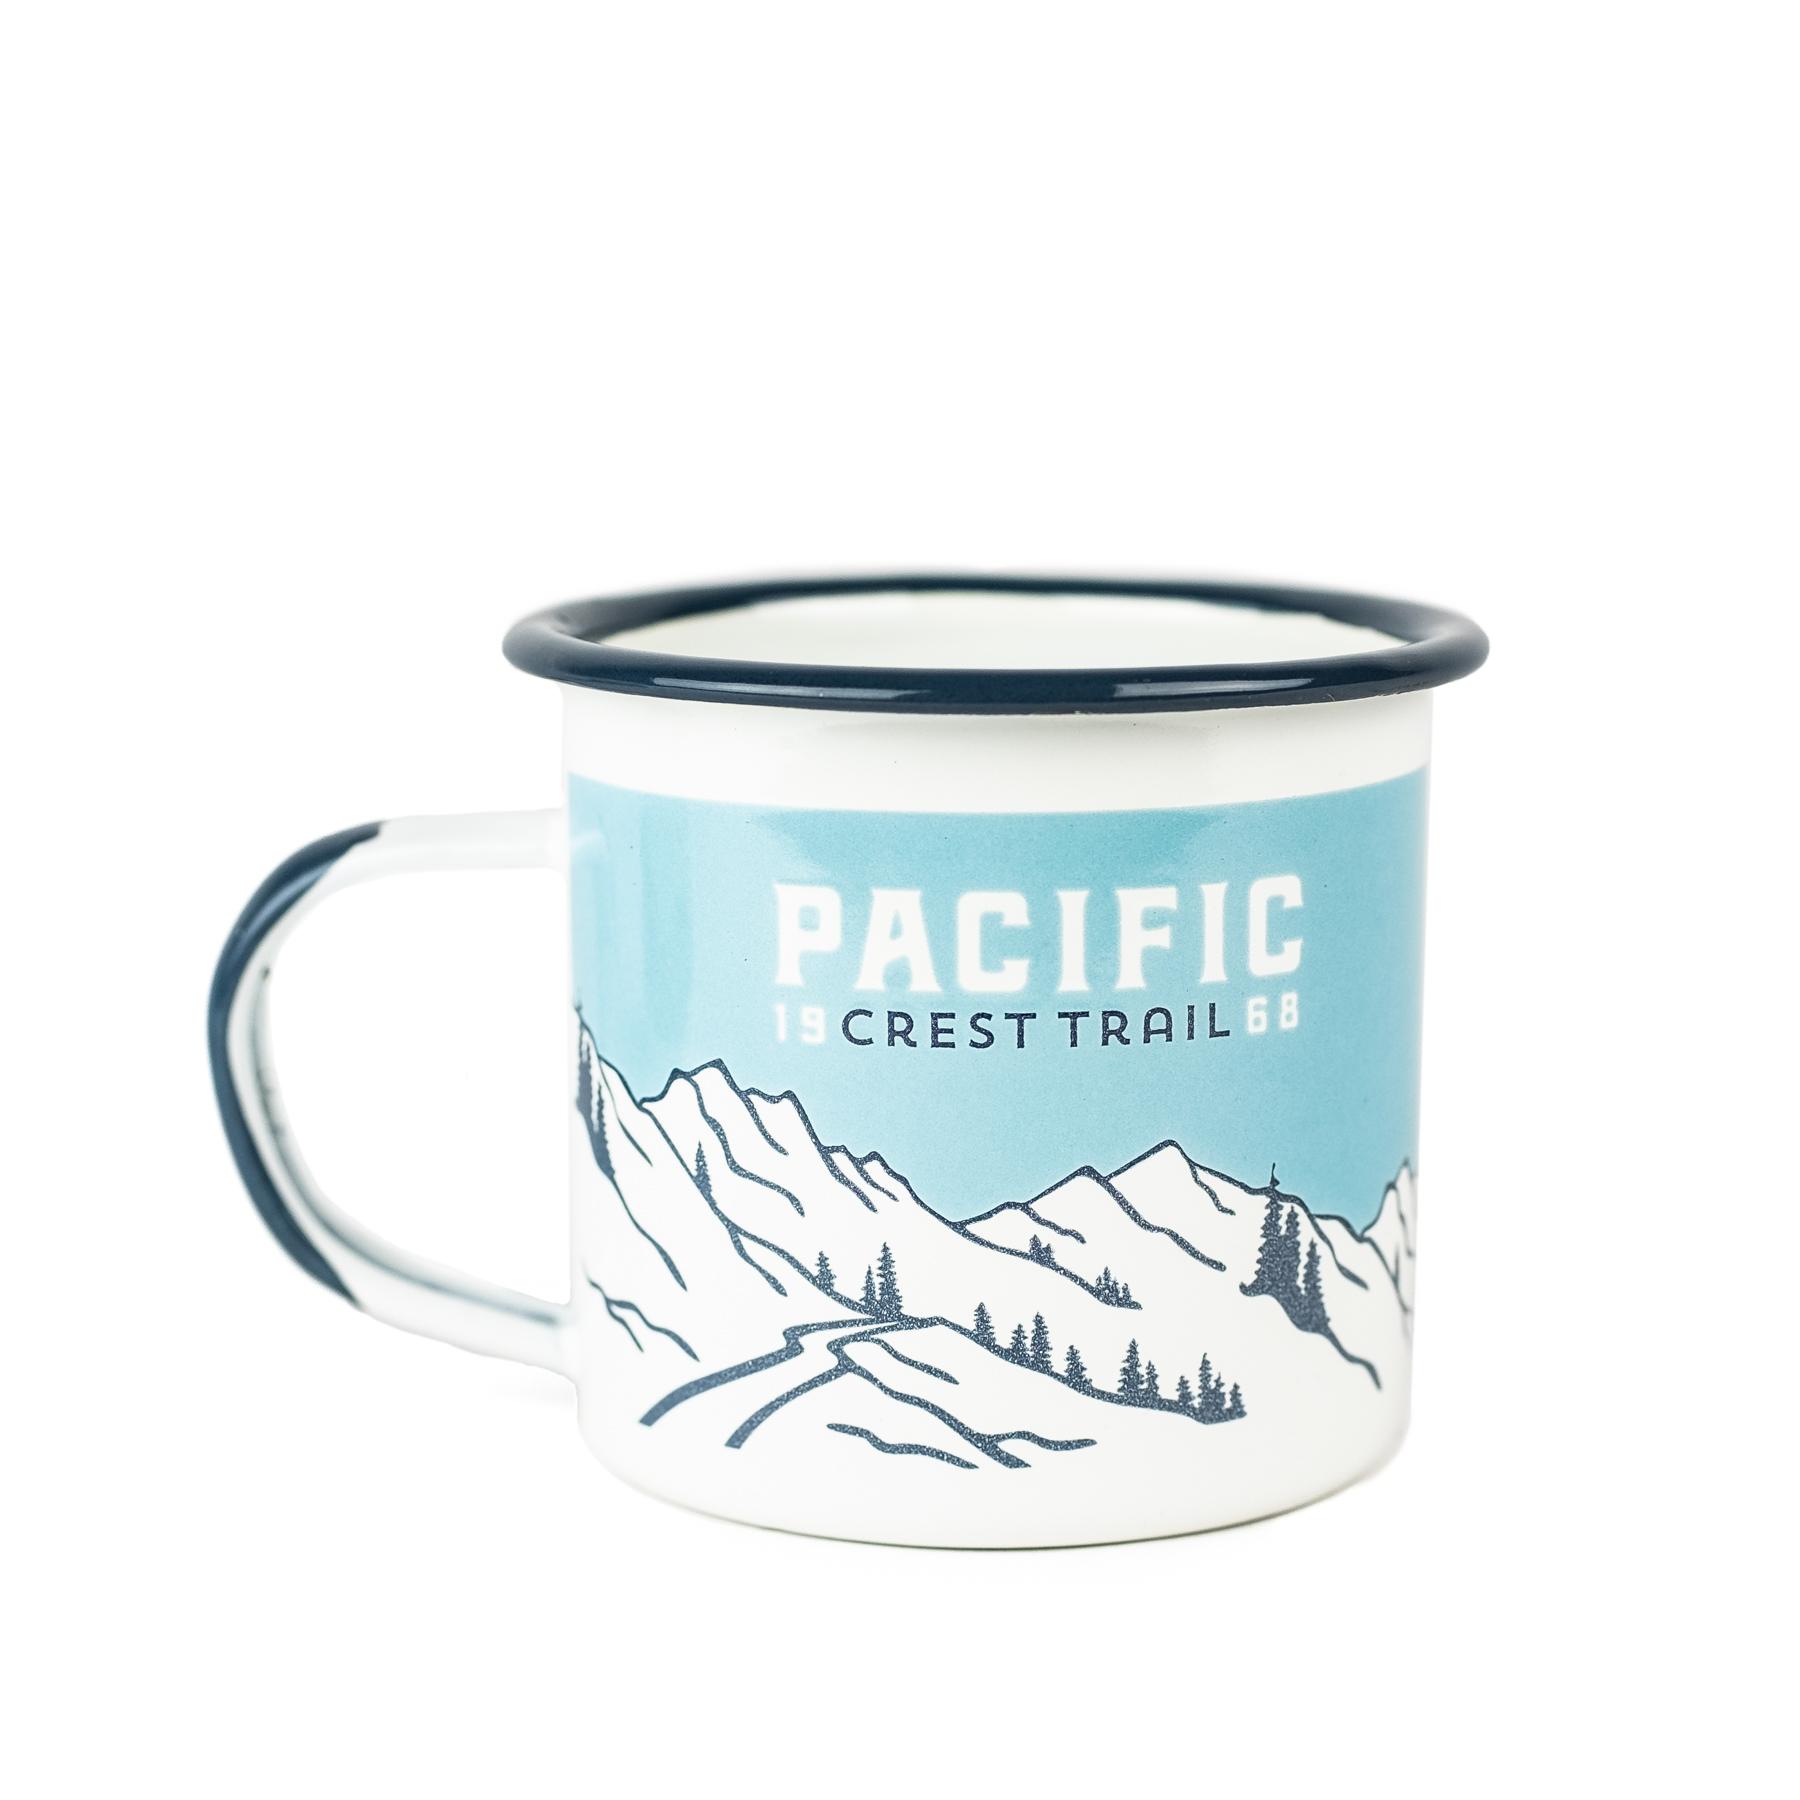 pacific-crest-trail-mug-3.jpg